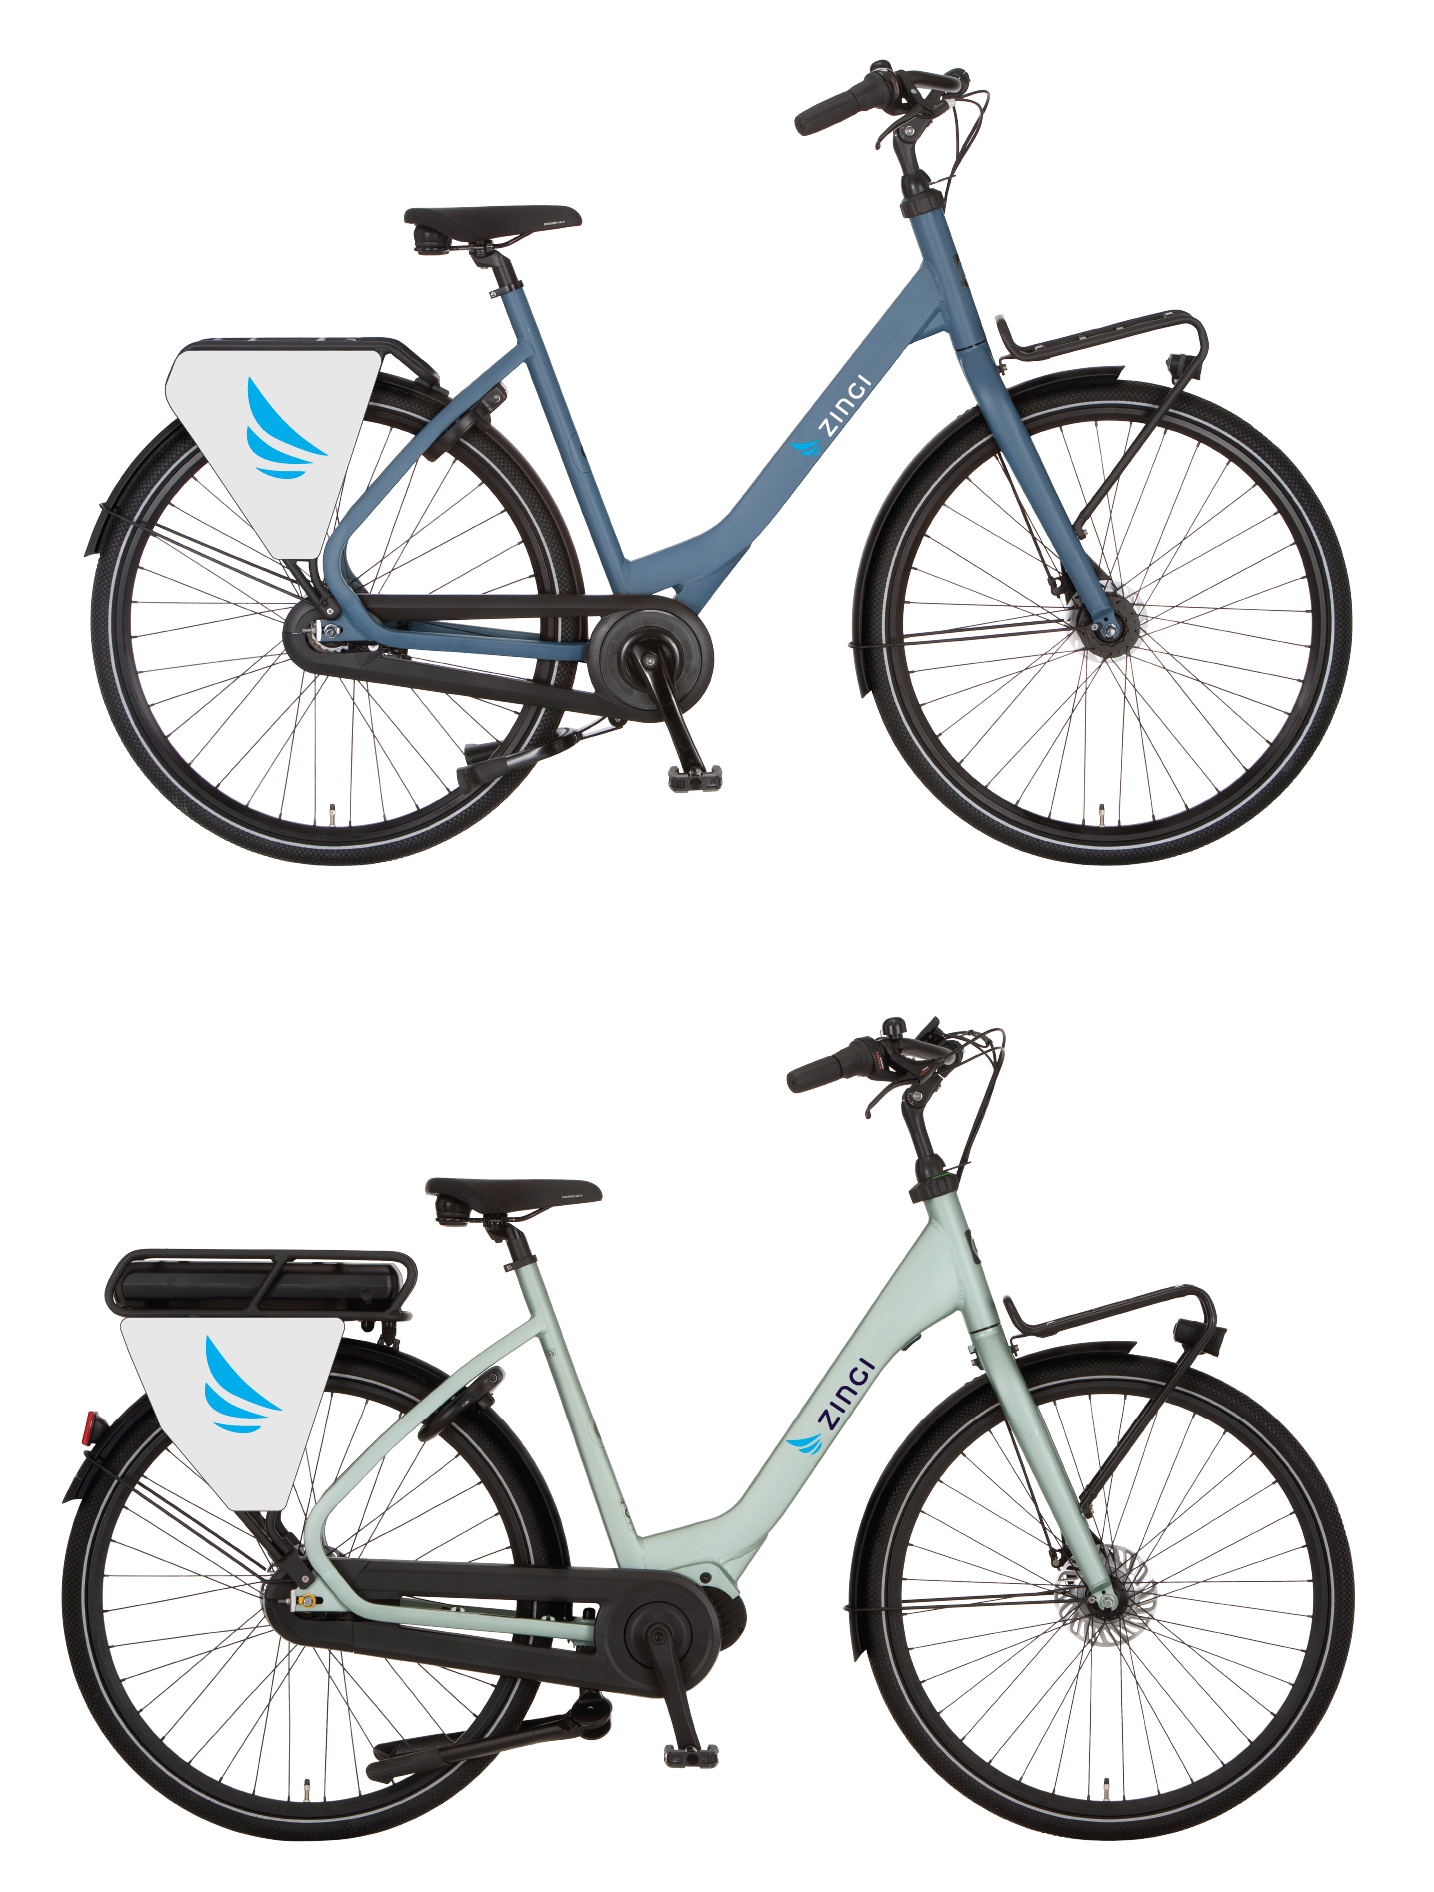 Zingi stadsfiets en e-bike